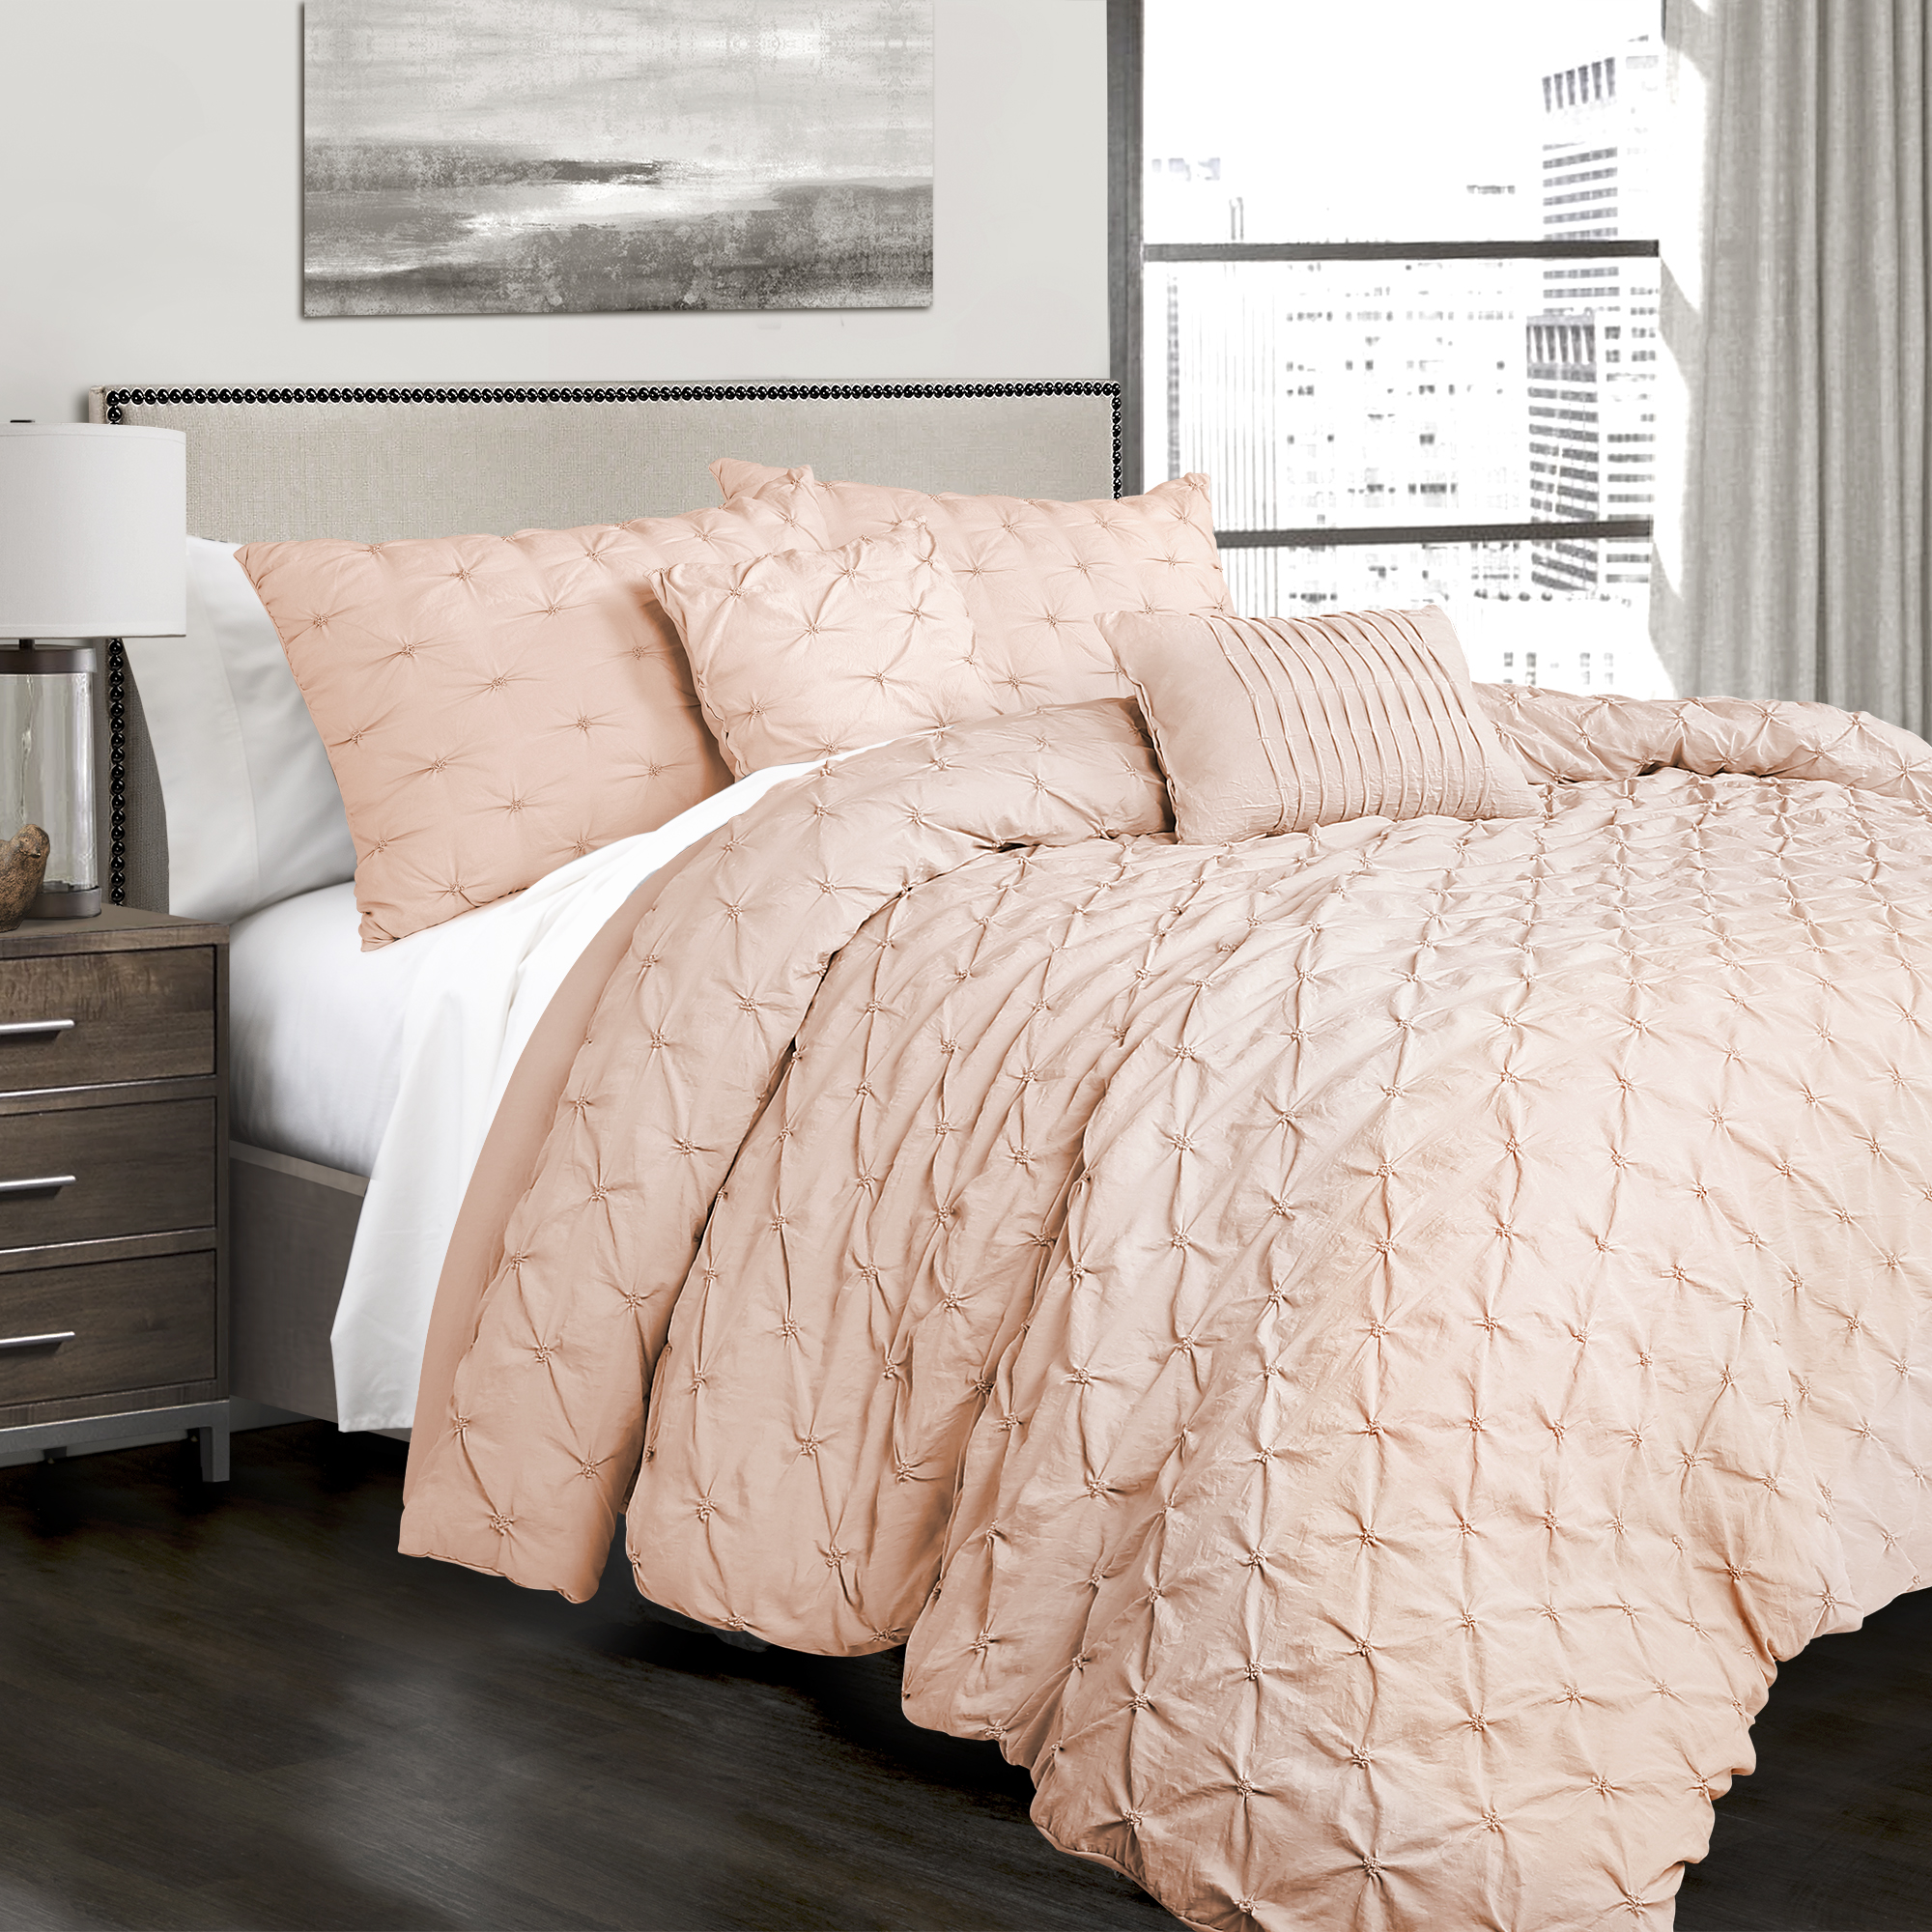 King 5pc Ravello Pintuck Comforter Set Blush - Lush Décor